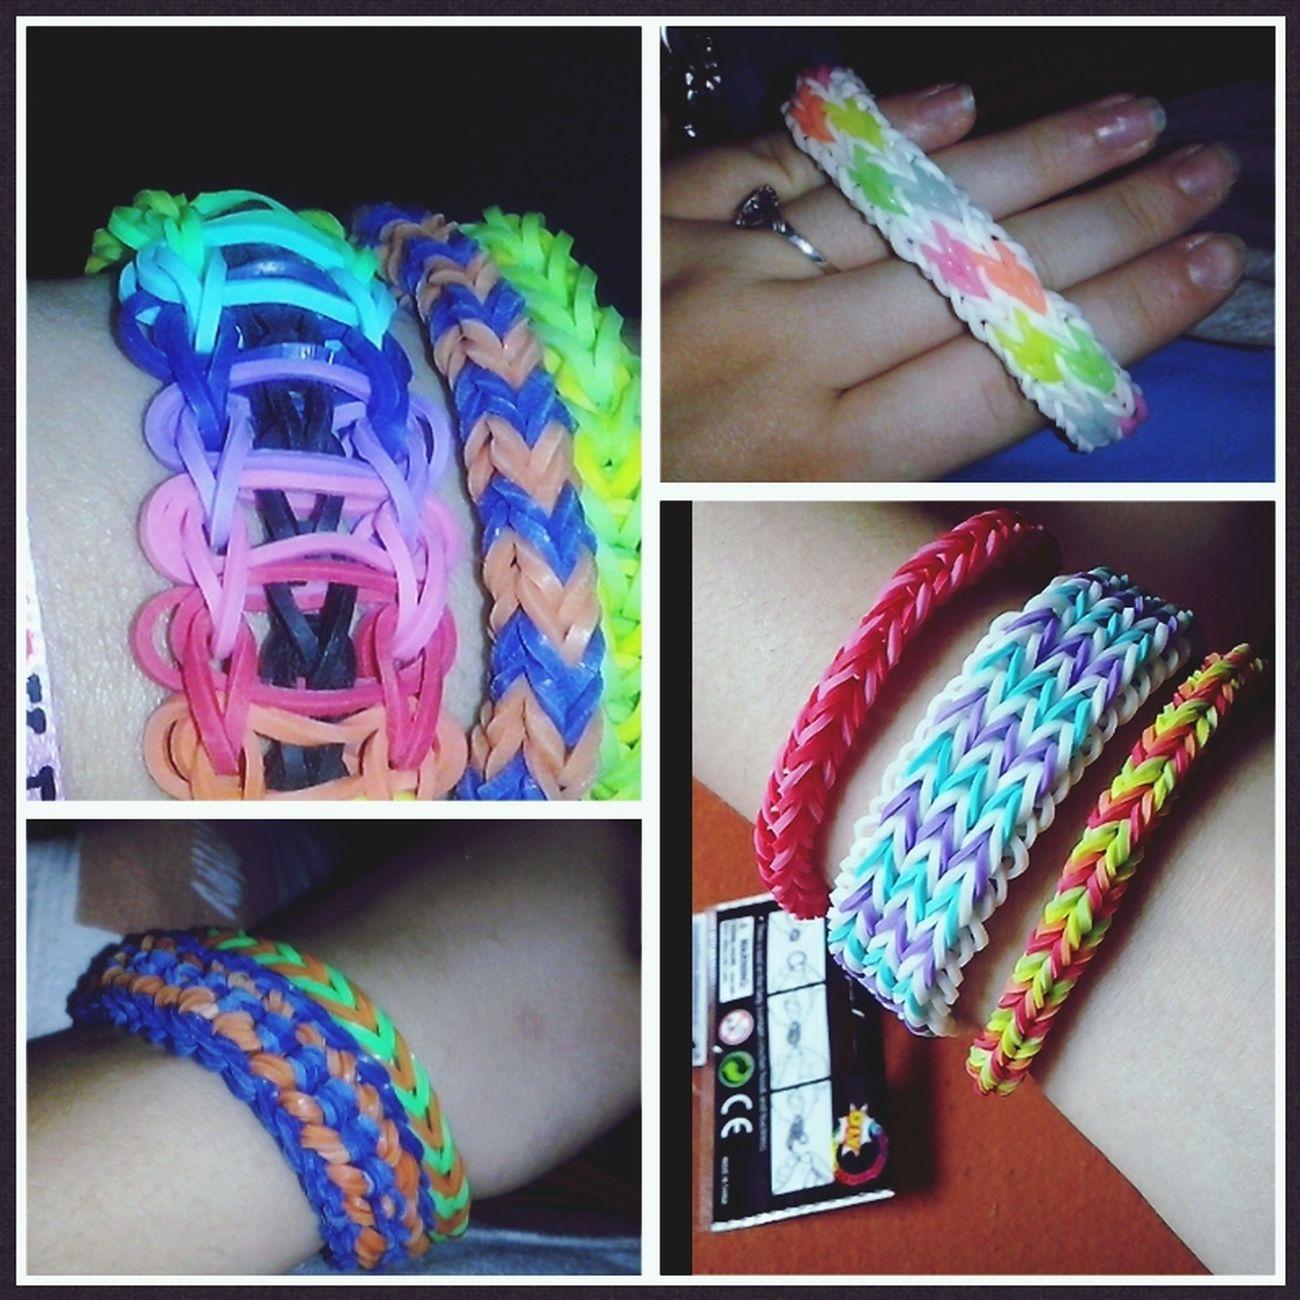 Rainbow Loom Bracelet Kreatives My Baby Make Me Happy ((;